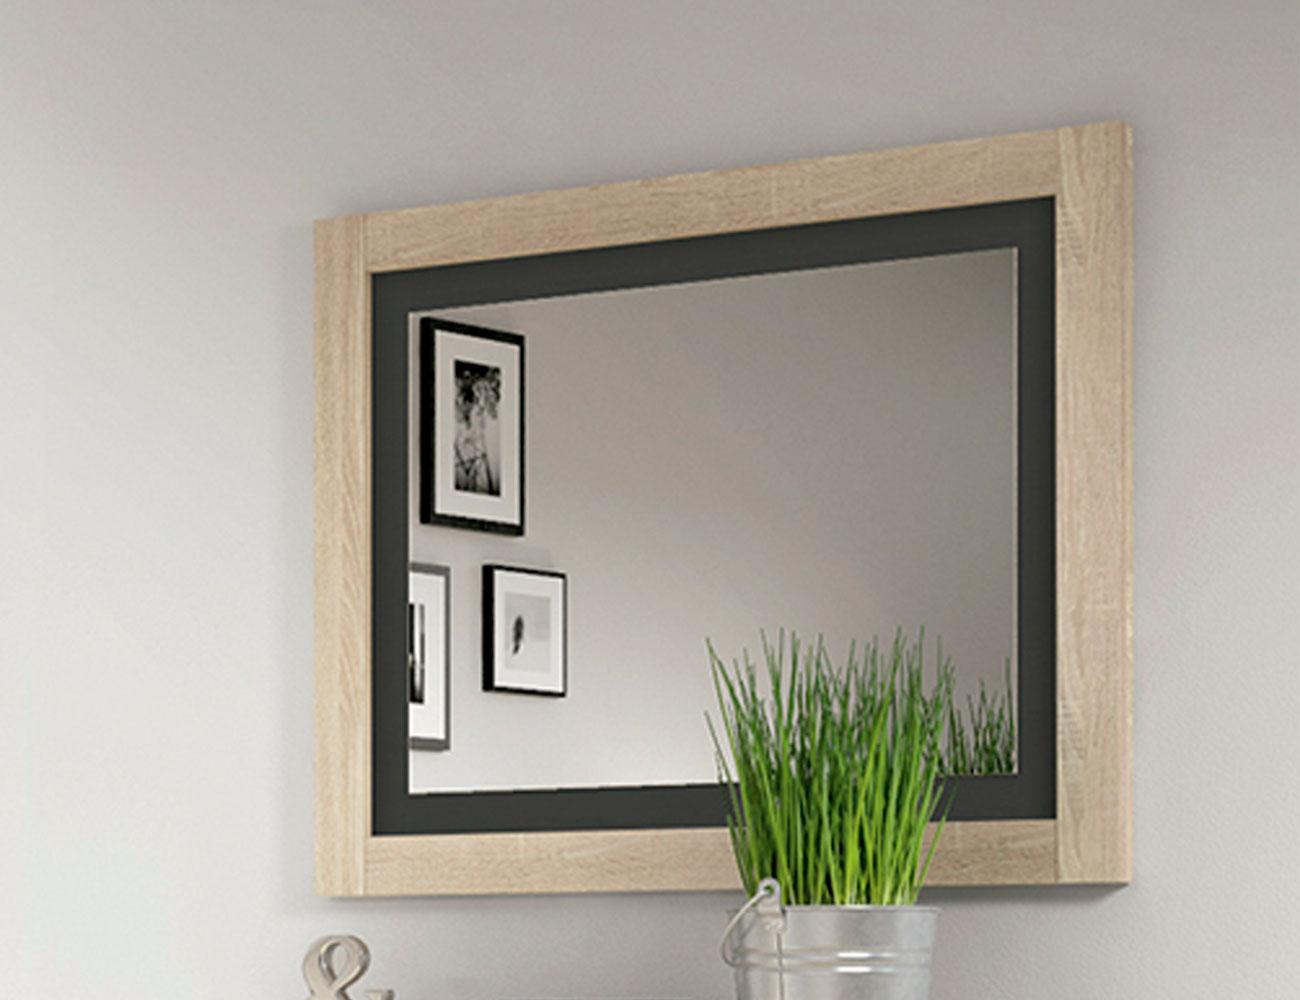 Marco espejo moderno para c moda 2123 factory del for Marcos para espejos modernos